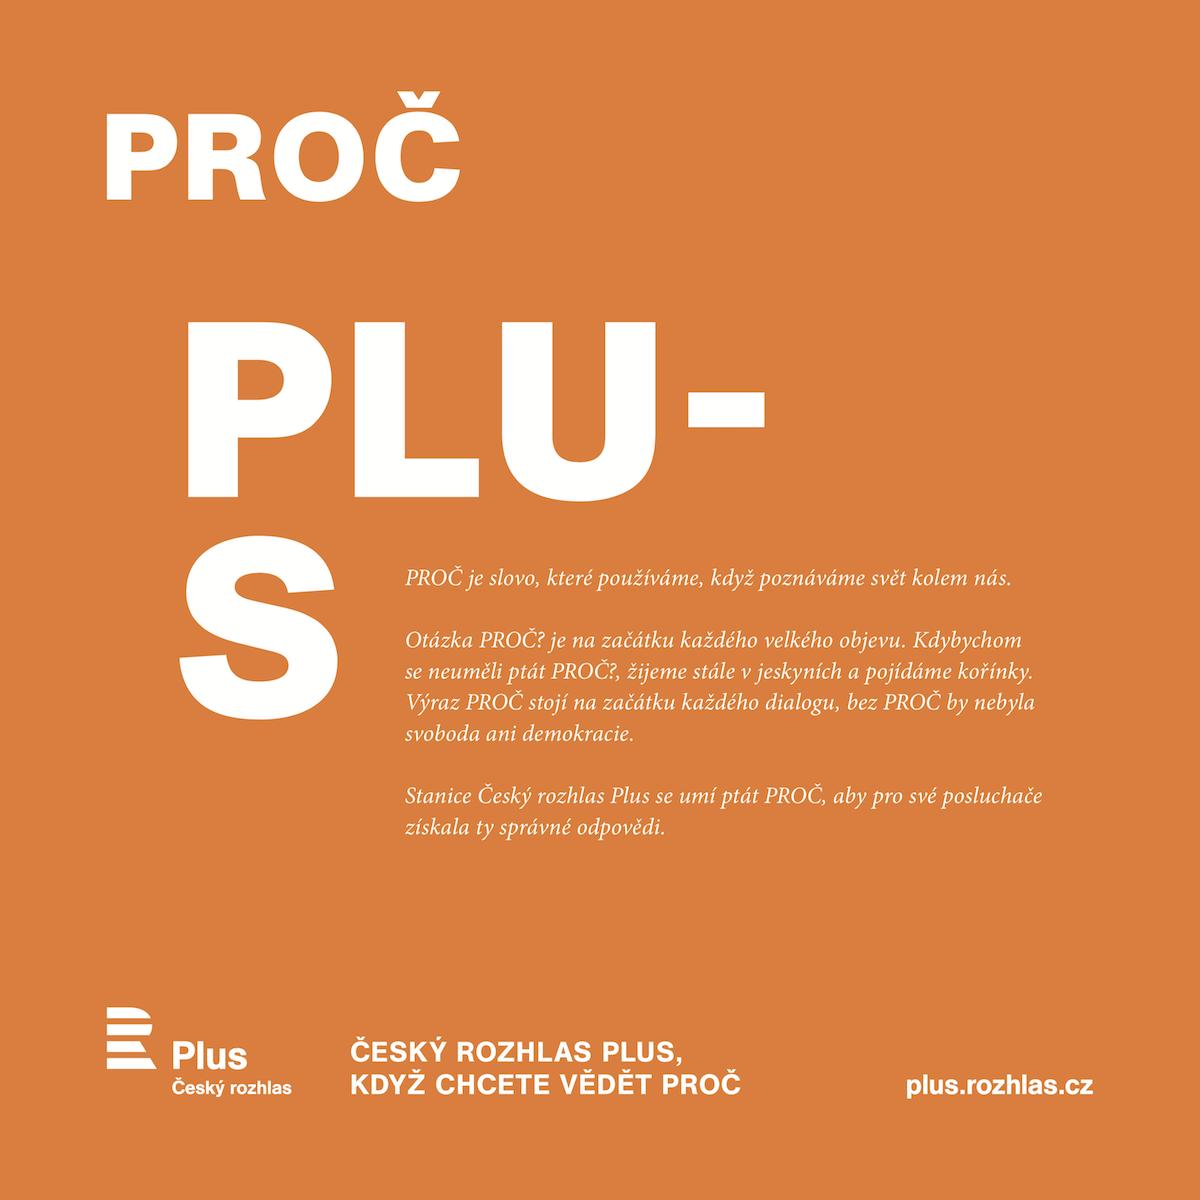 Český rozhlas Plus: Plus